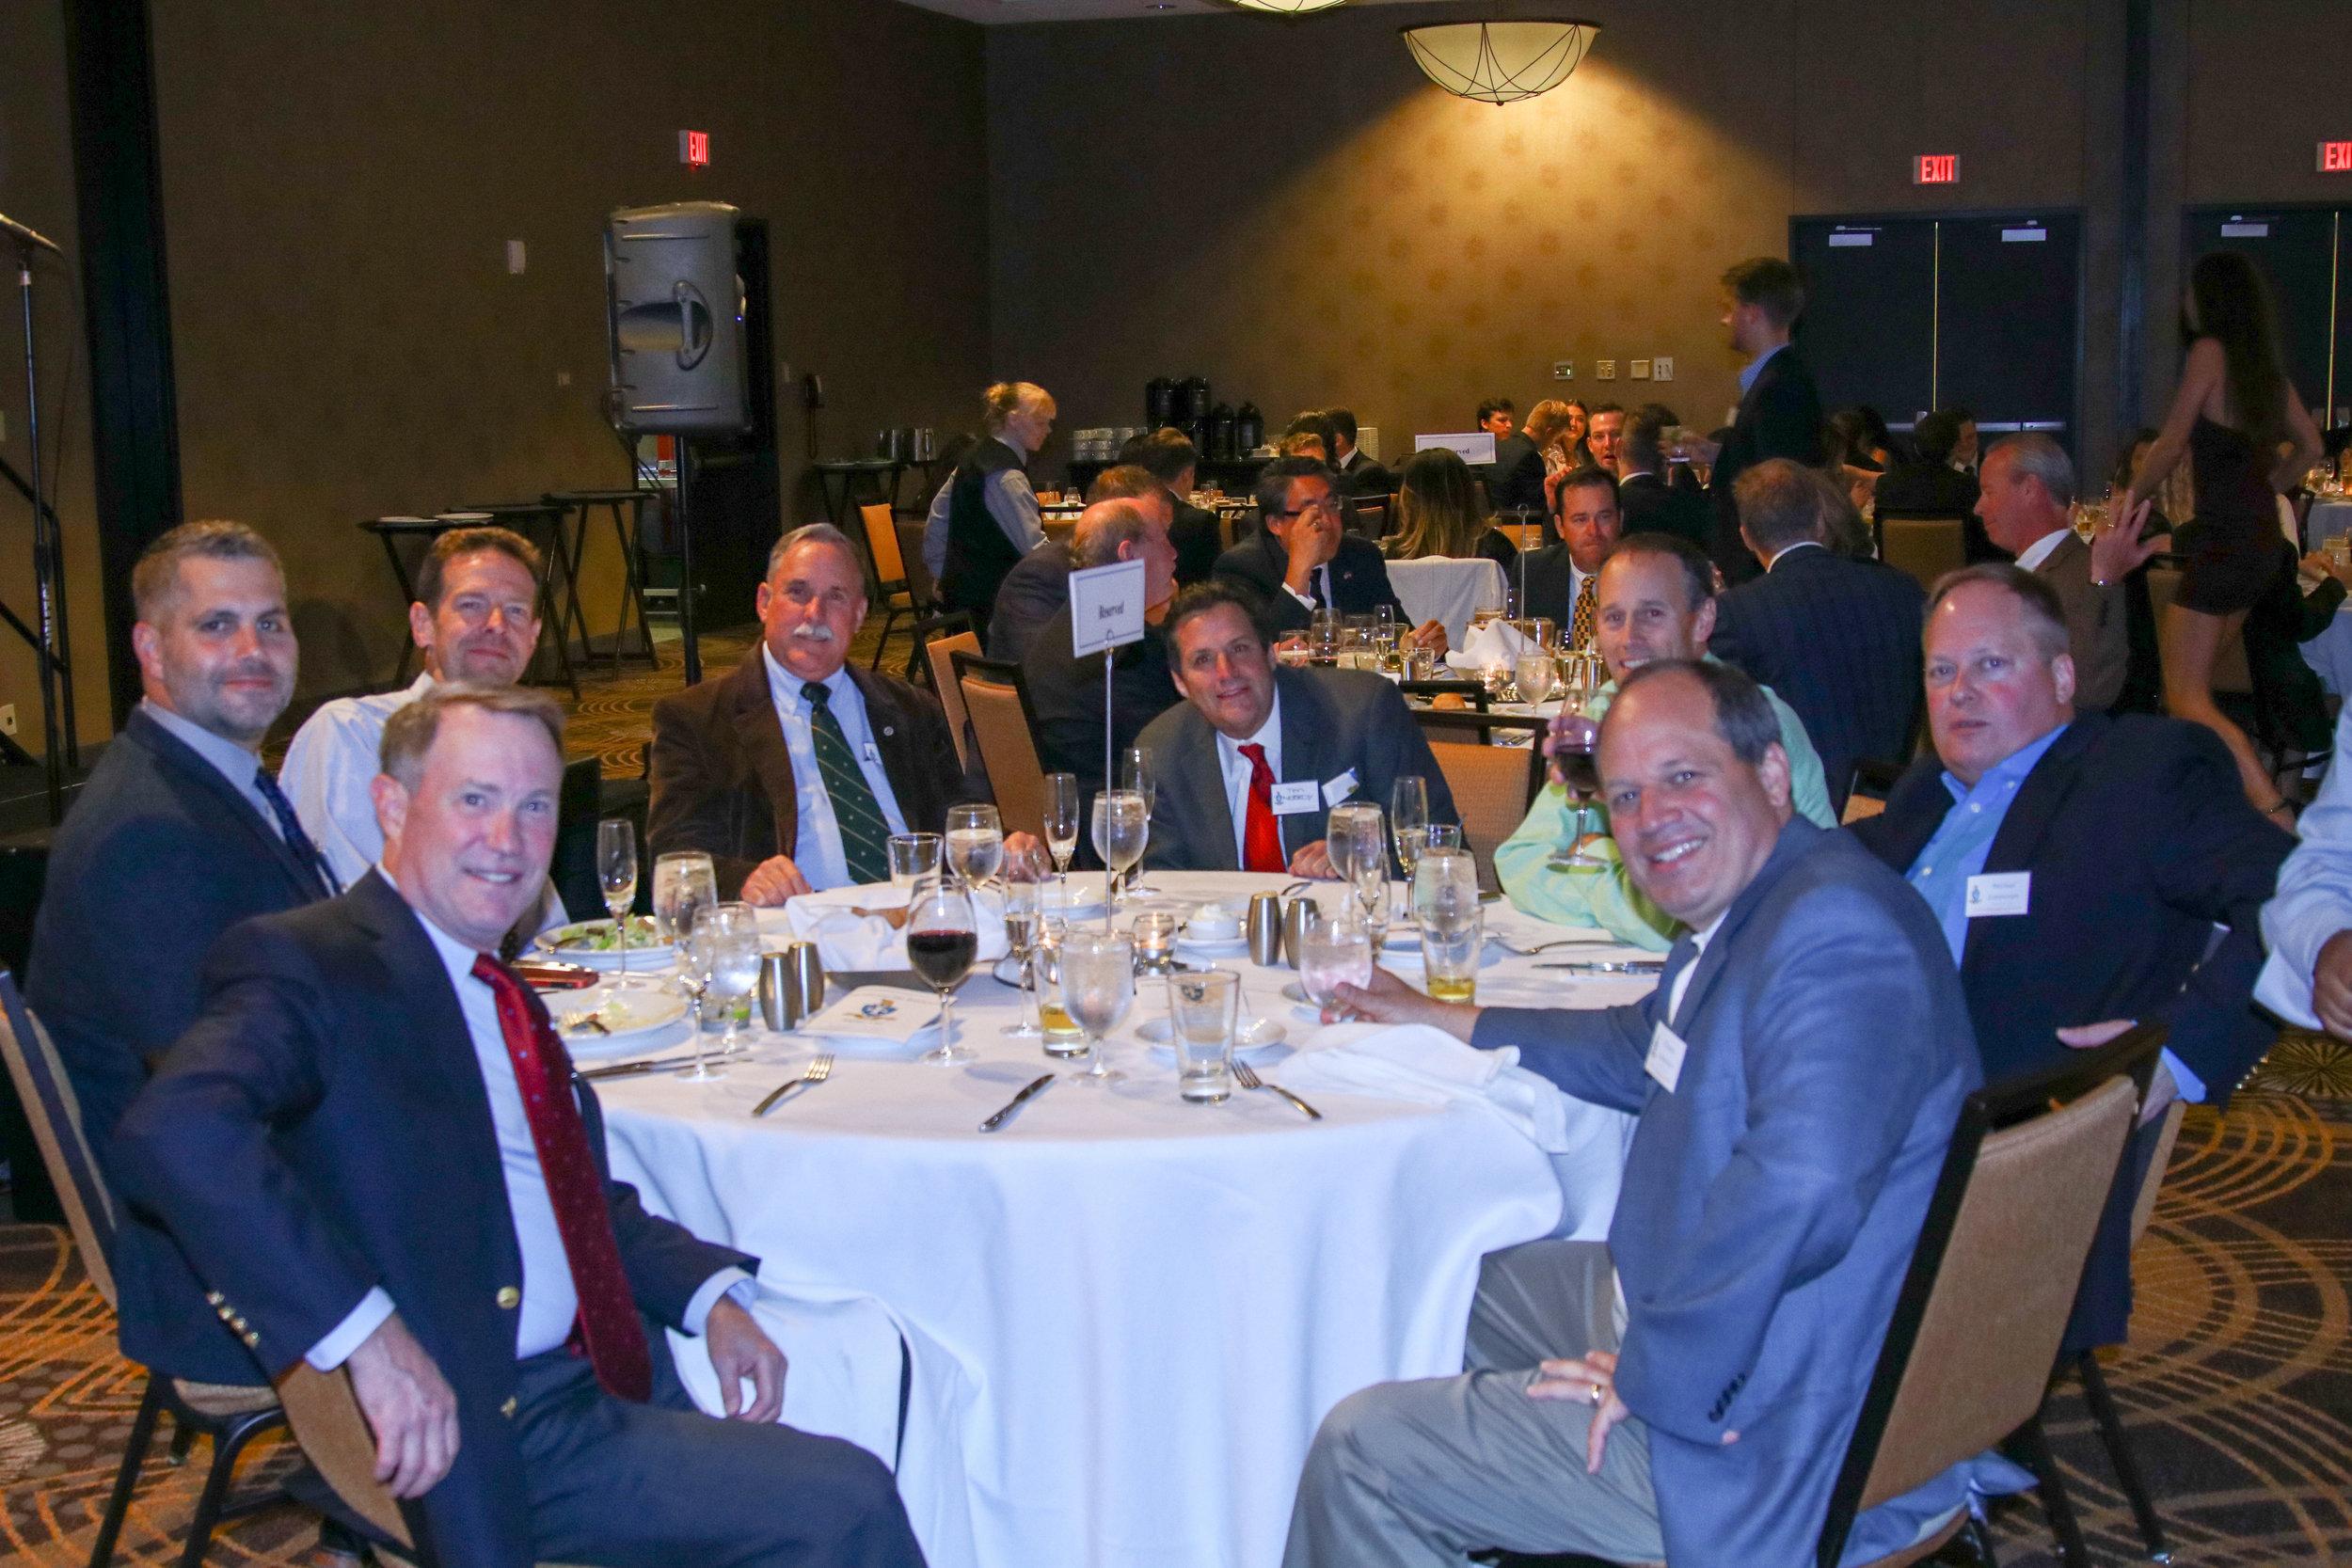 Dan Greenshields joined by Alumni at his Significant Sig, (May 2017)